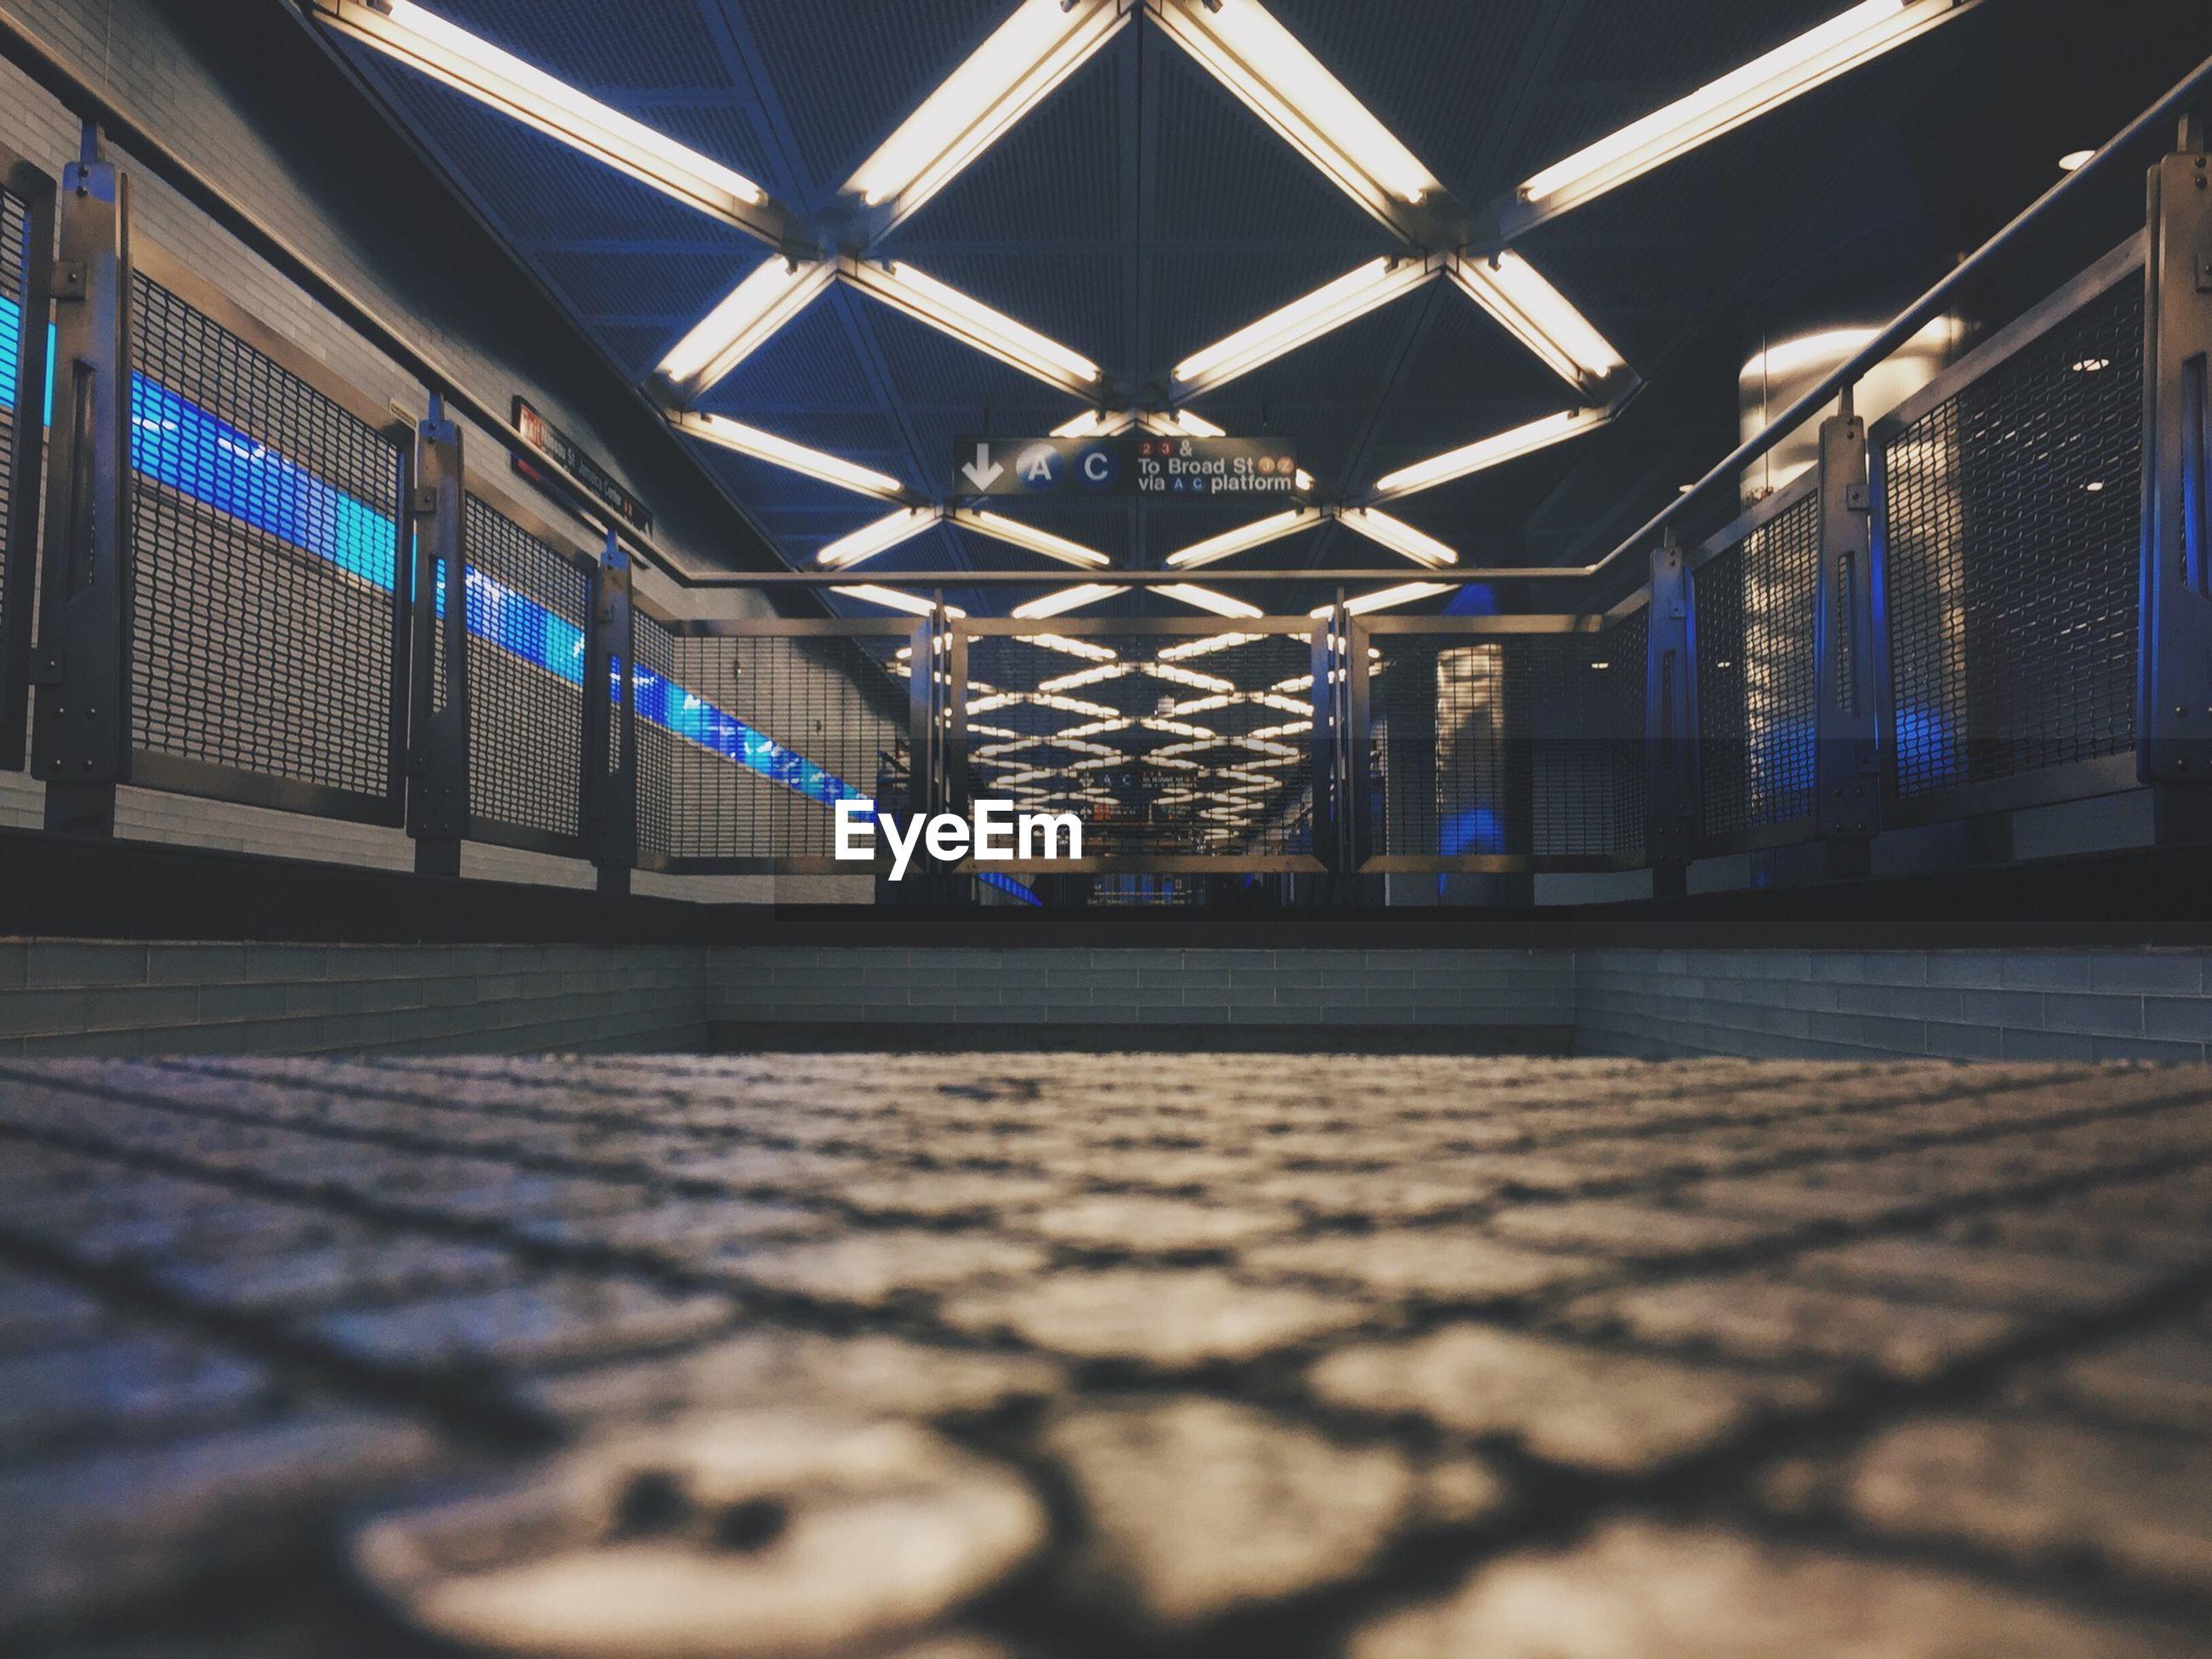 Walkway against illuminated ceiling at subway station